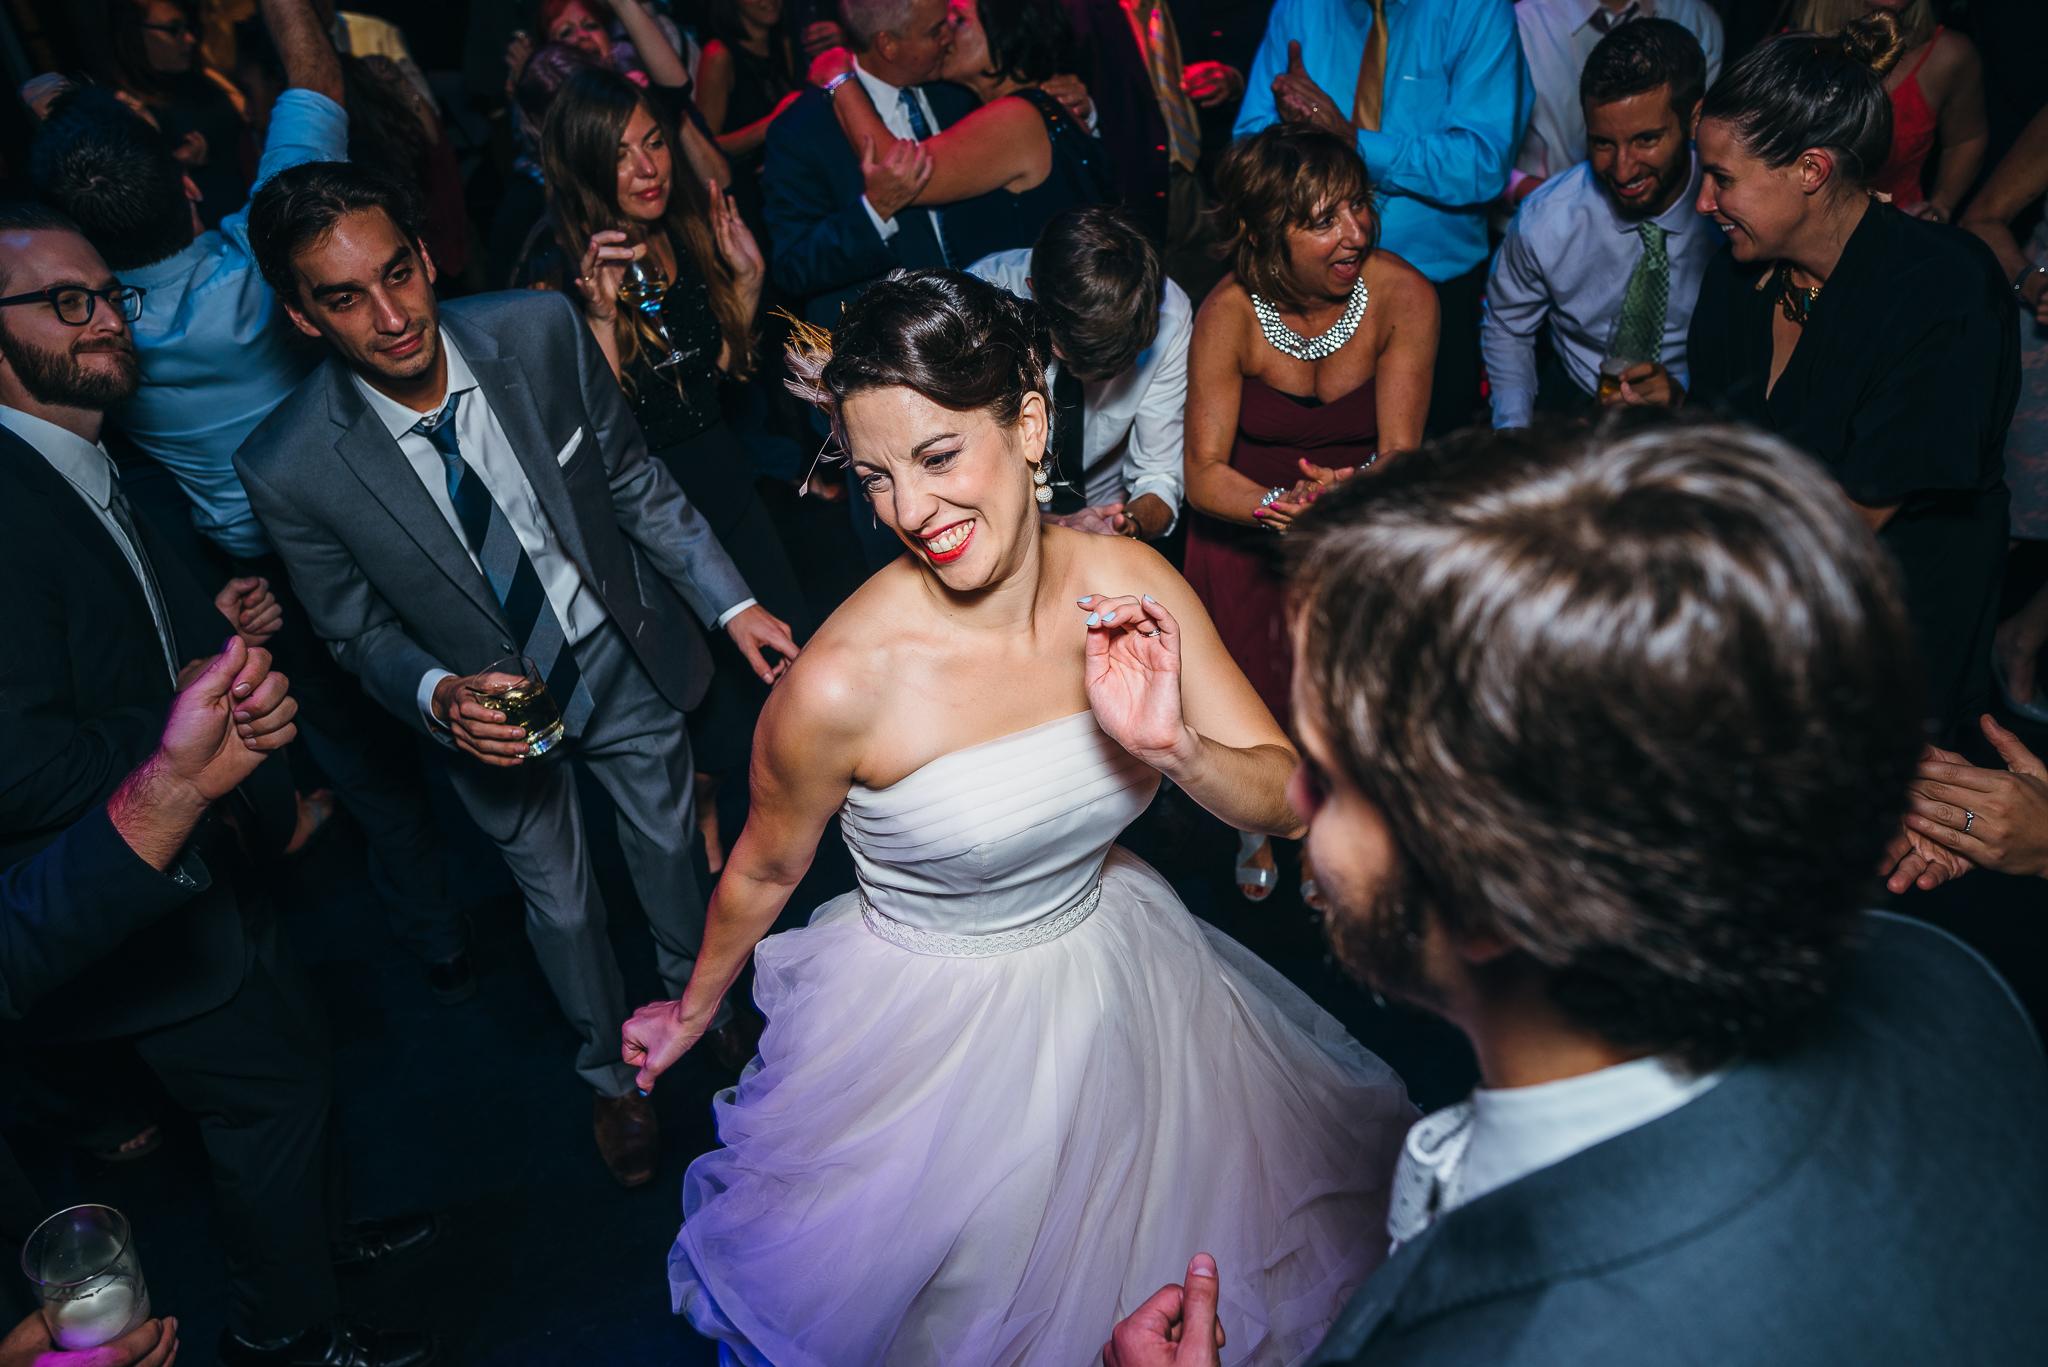 la_peg_fringe_arts_wedding-0051.jpg